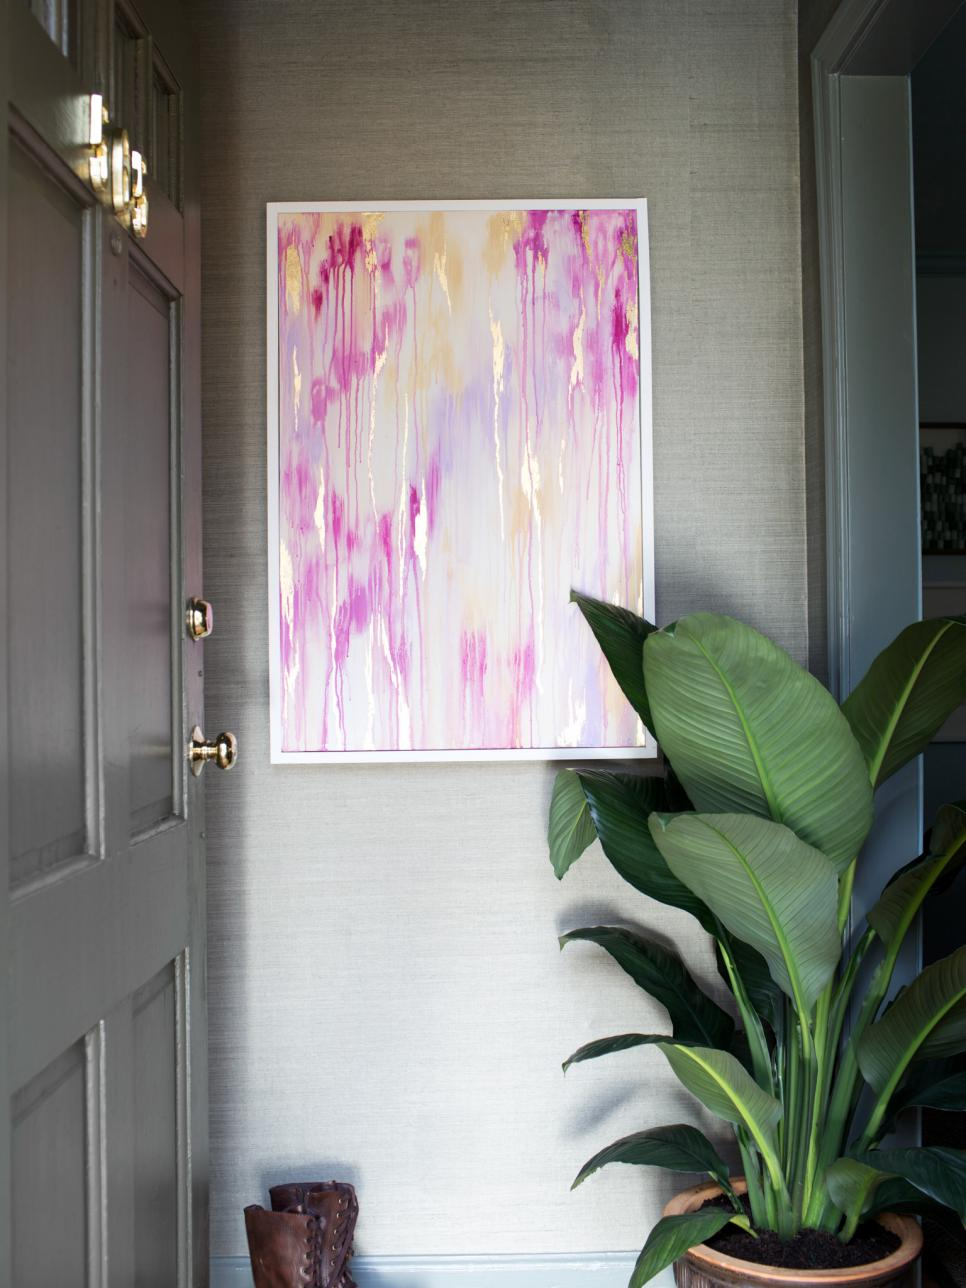 Bpf spring house interior abstract art spray bottle art distance v jpg rend hgtvcom 966 1288